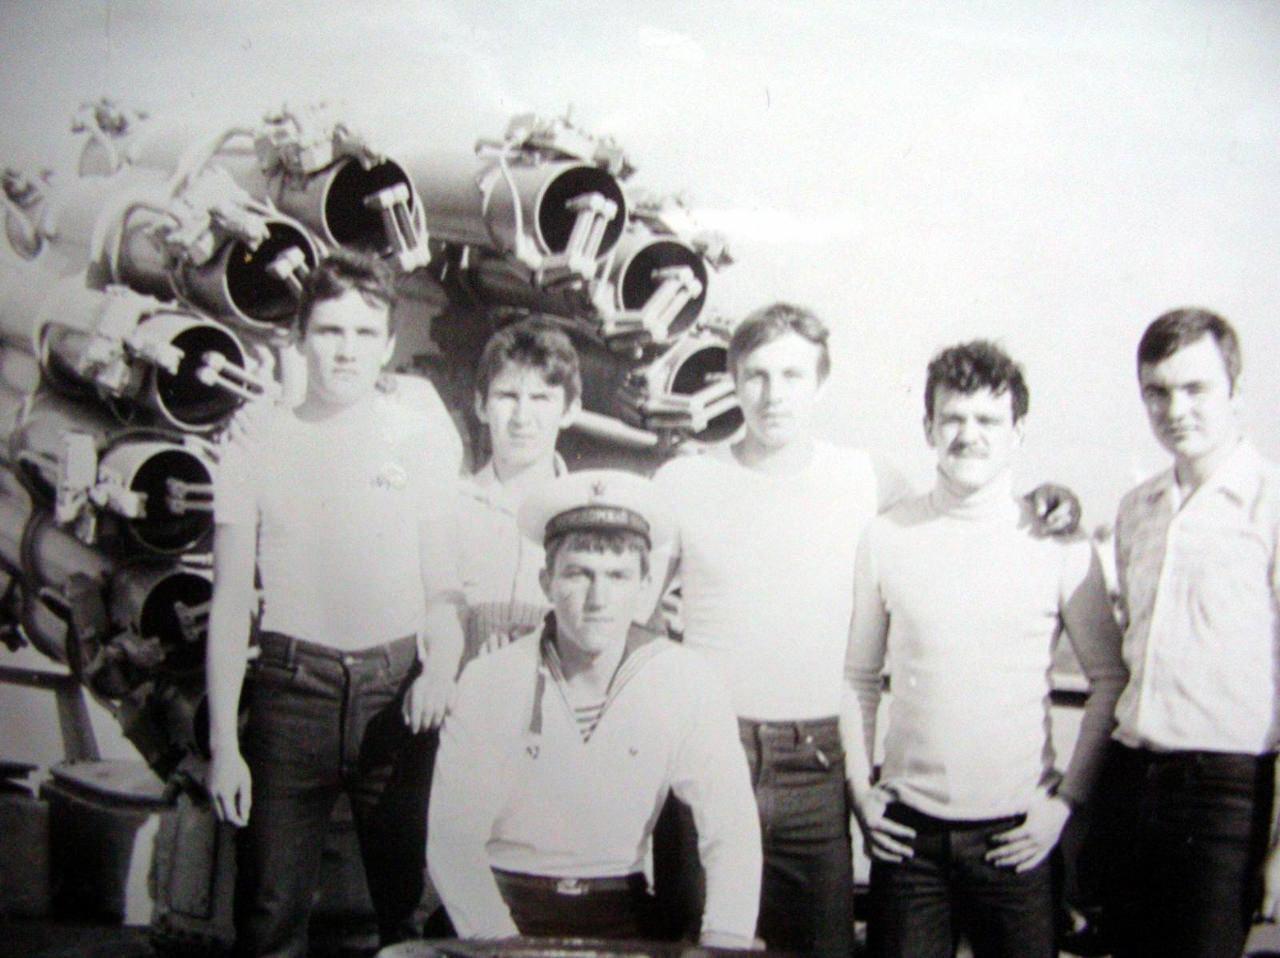 Лето 1984. На борту противолодочного крейсера (ПКР) [вертолетоносца] «Ленинград»